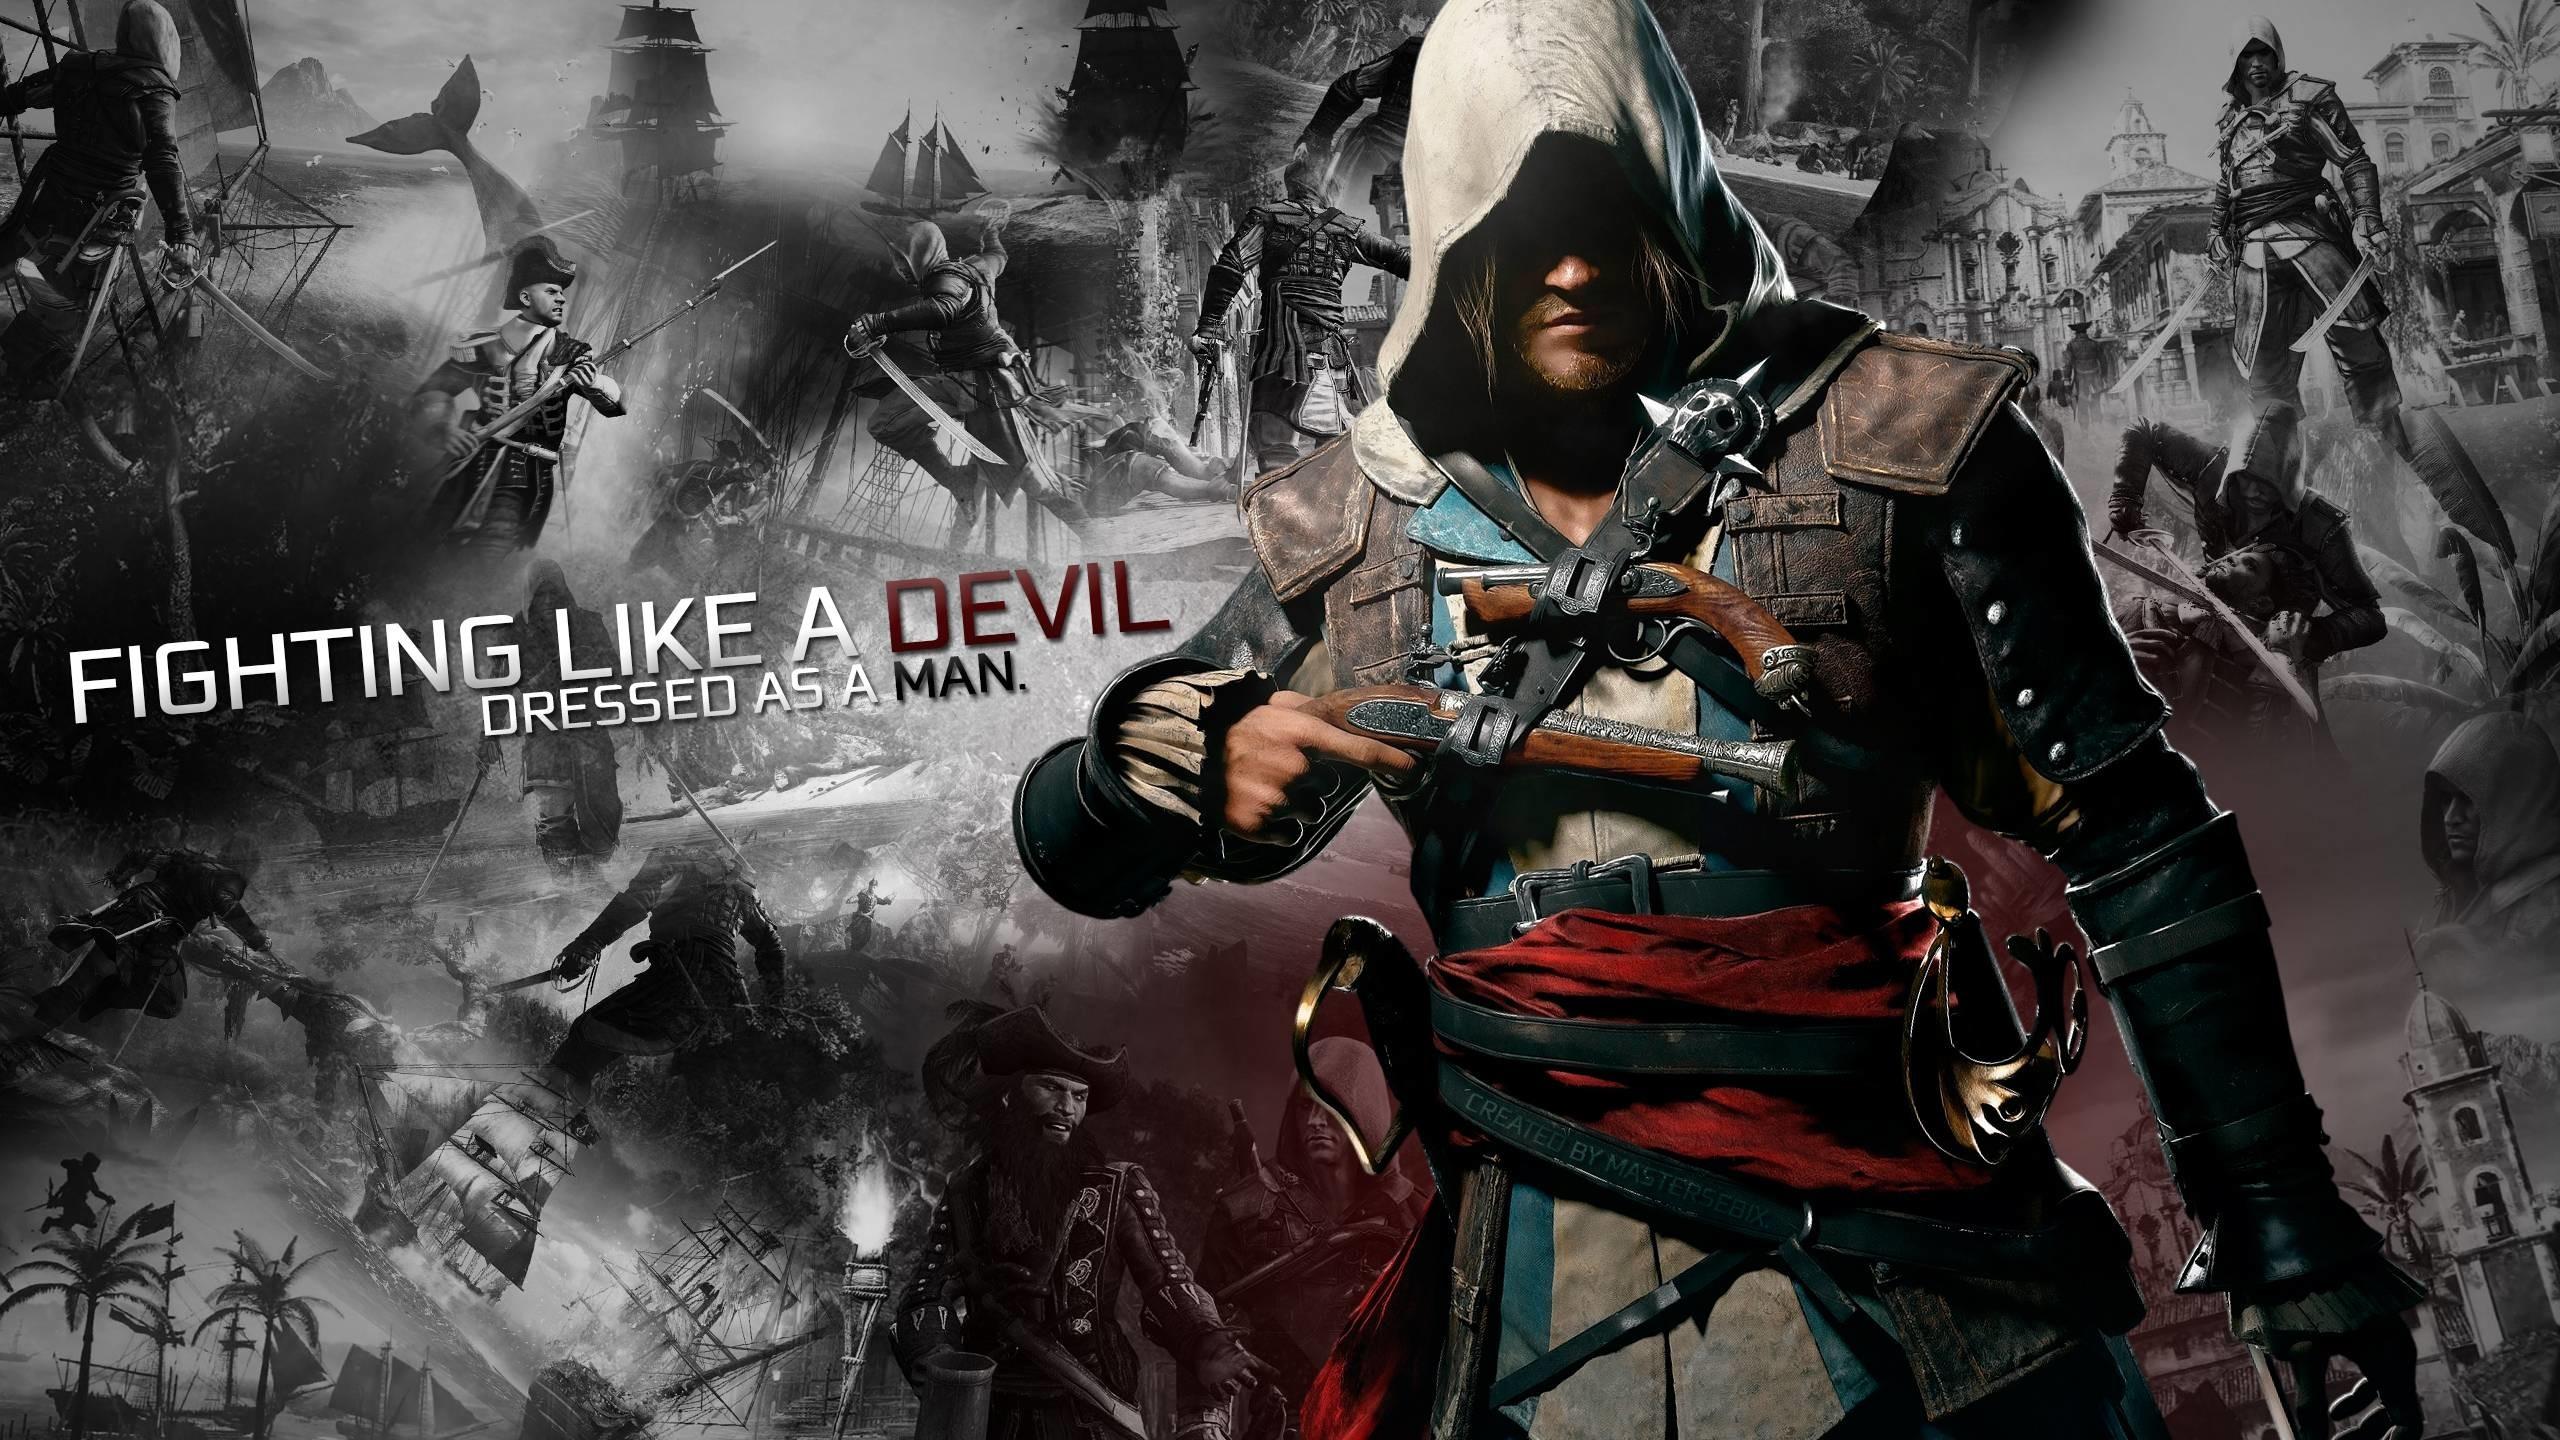 assassins-creed-4-black-flag-wallpaper-in-hd-